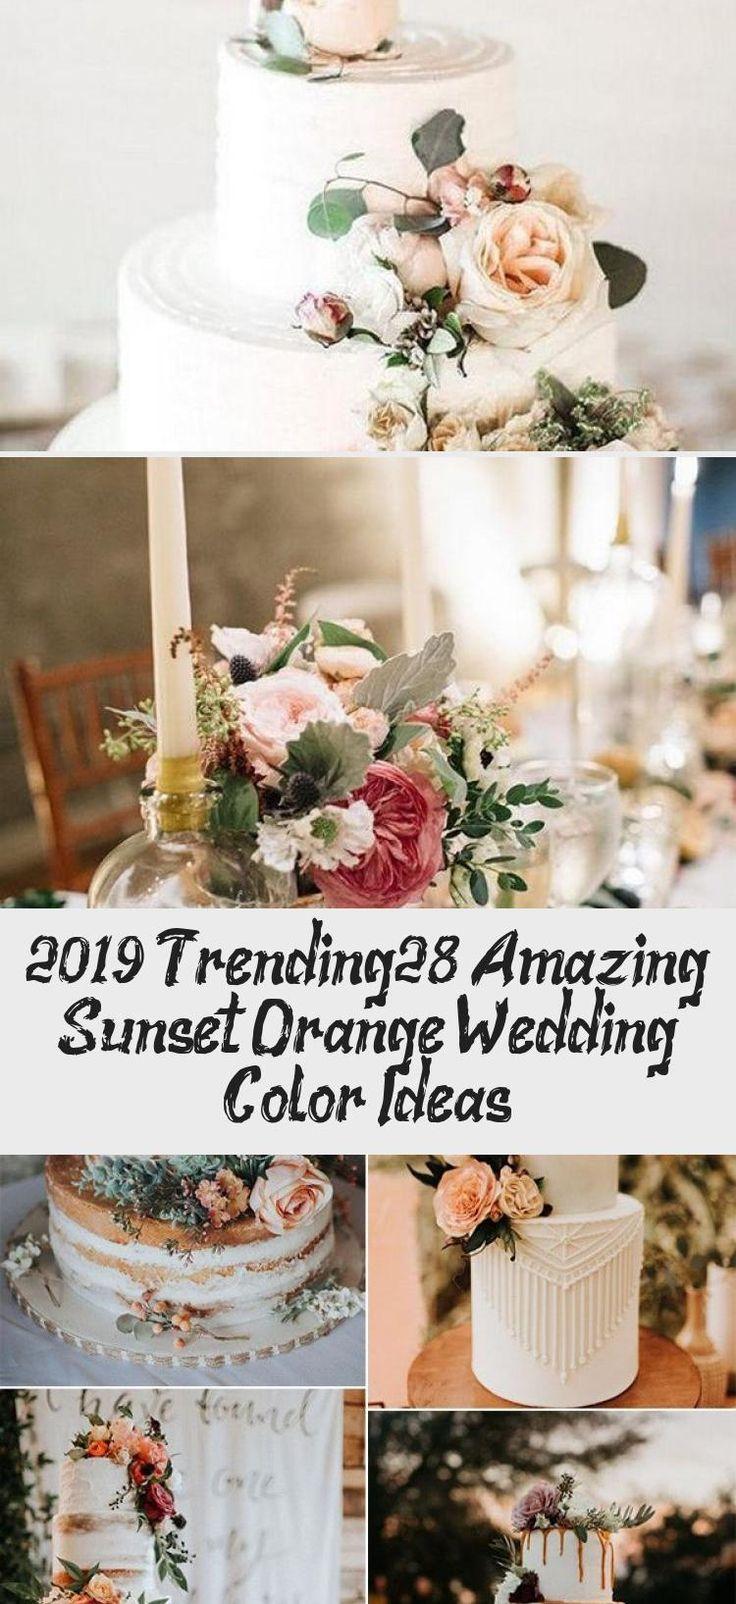 dusty orange mix and match bridesmaid dresses #BridesmaidDressesPastel #BridesmaidDressesMuslim #VelvetBridesmaidDresses #PlumBridesmaidDresses #OrangeBridesmaidDresses